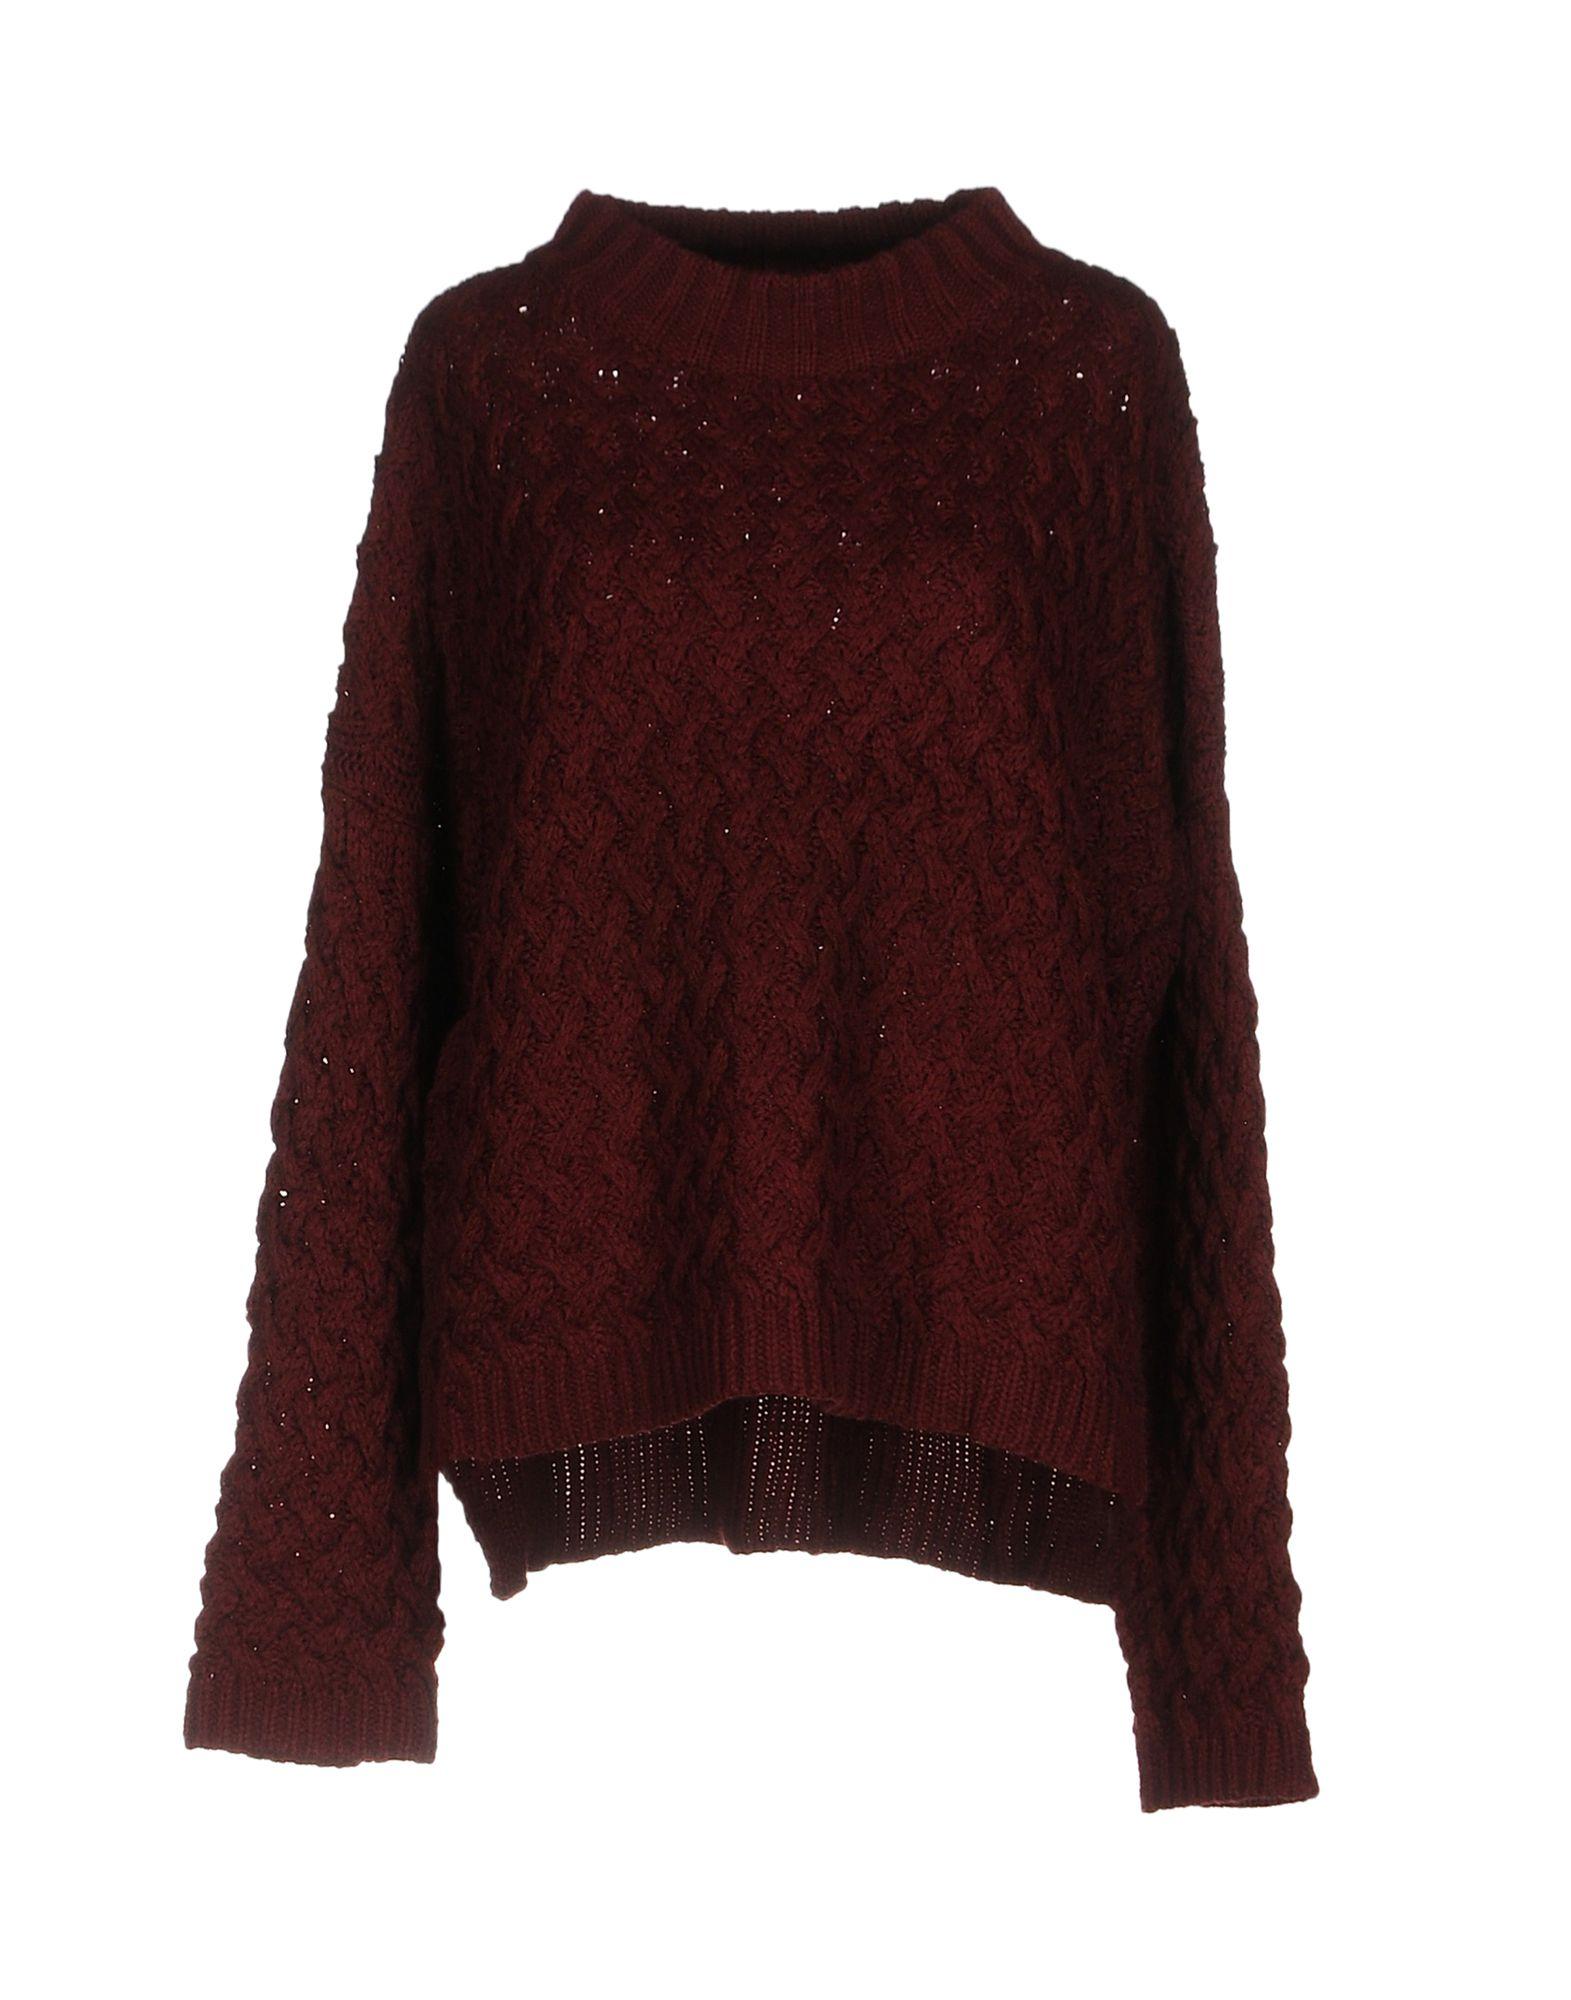 GOLDIE LONDON Sweater in Maroon